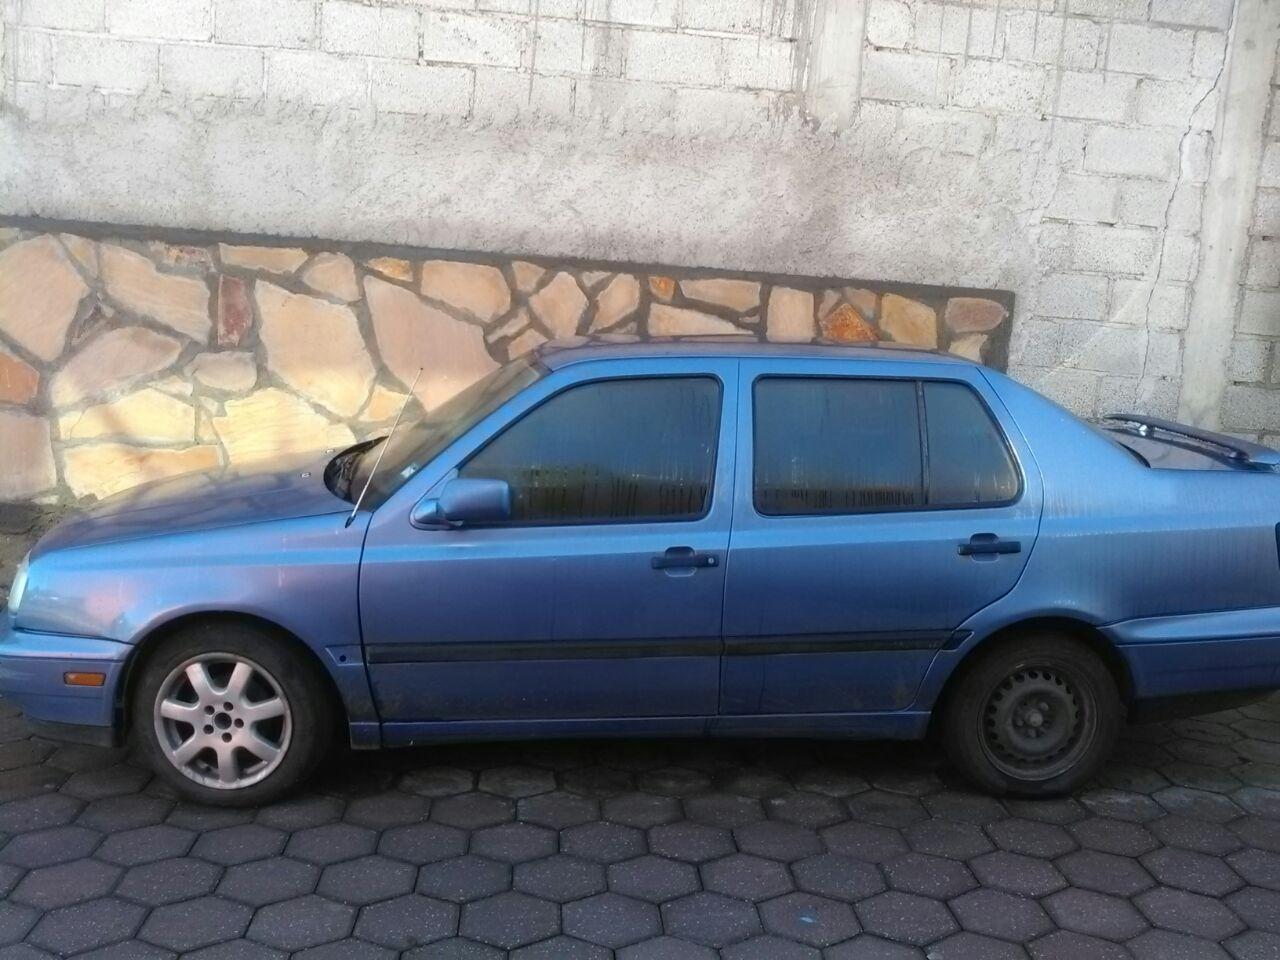 Recupera policía capitalina automóvil con reporte de robo